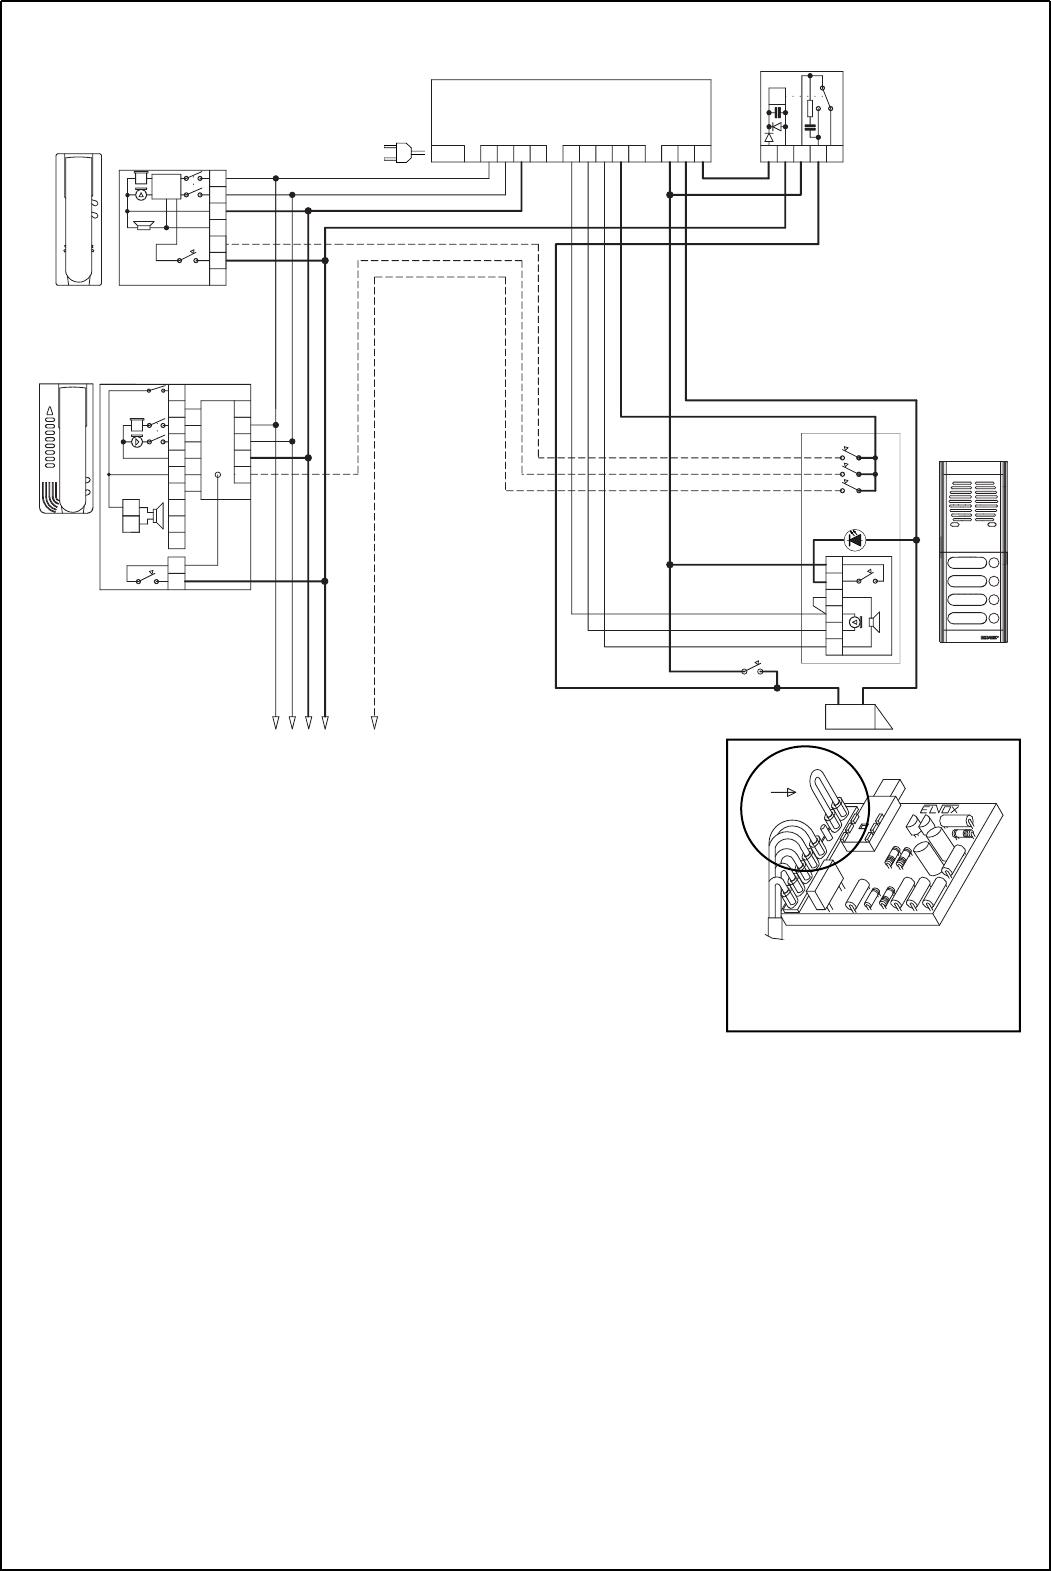 Philips Bodine Bsl310 Wiring Diagram